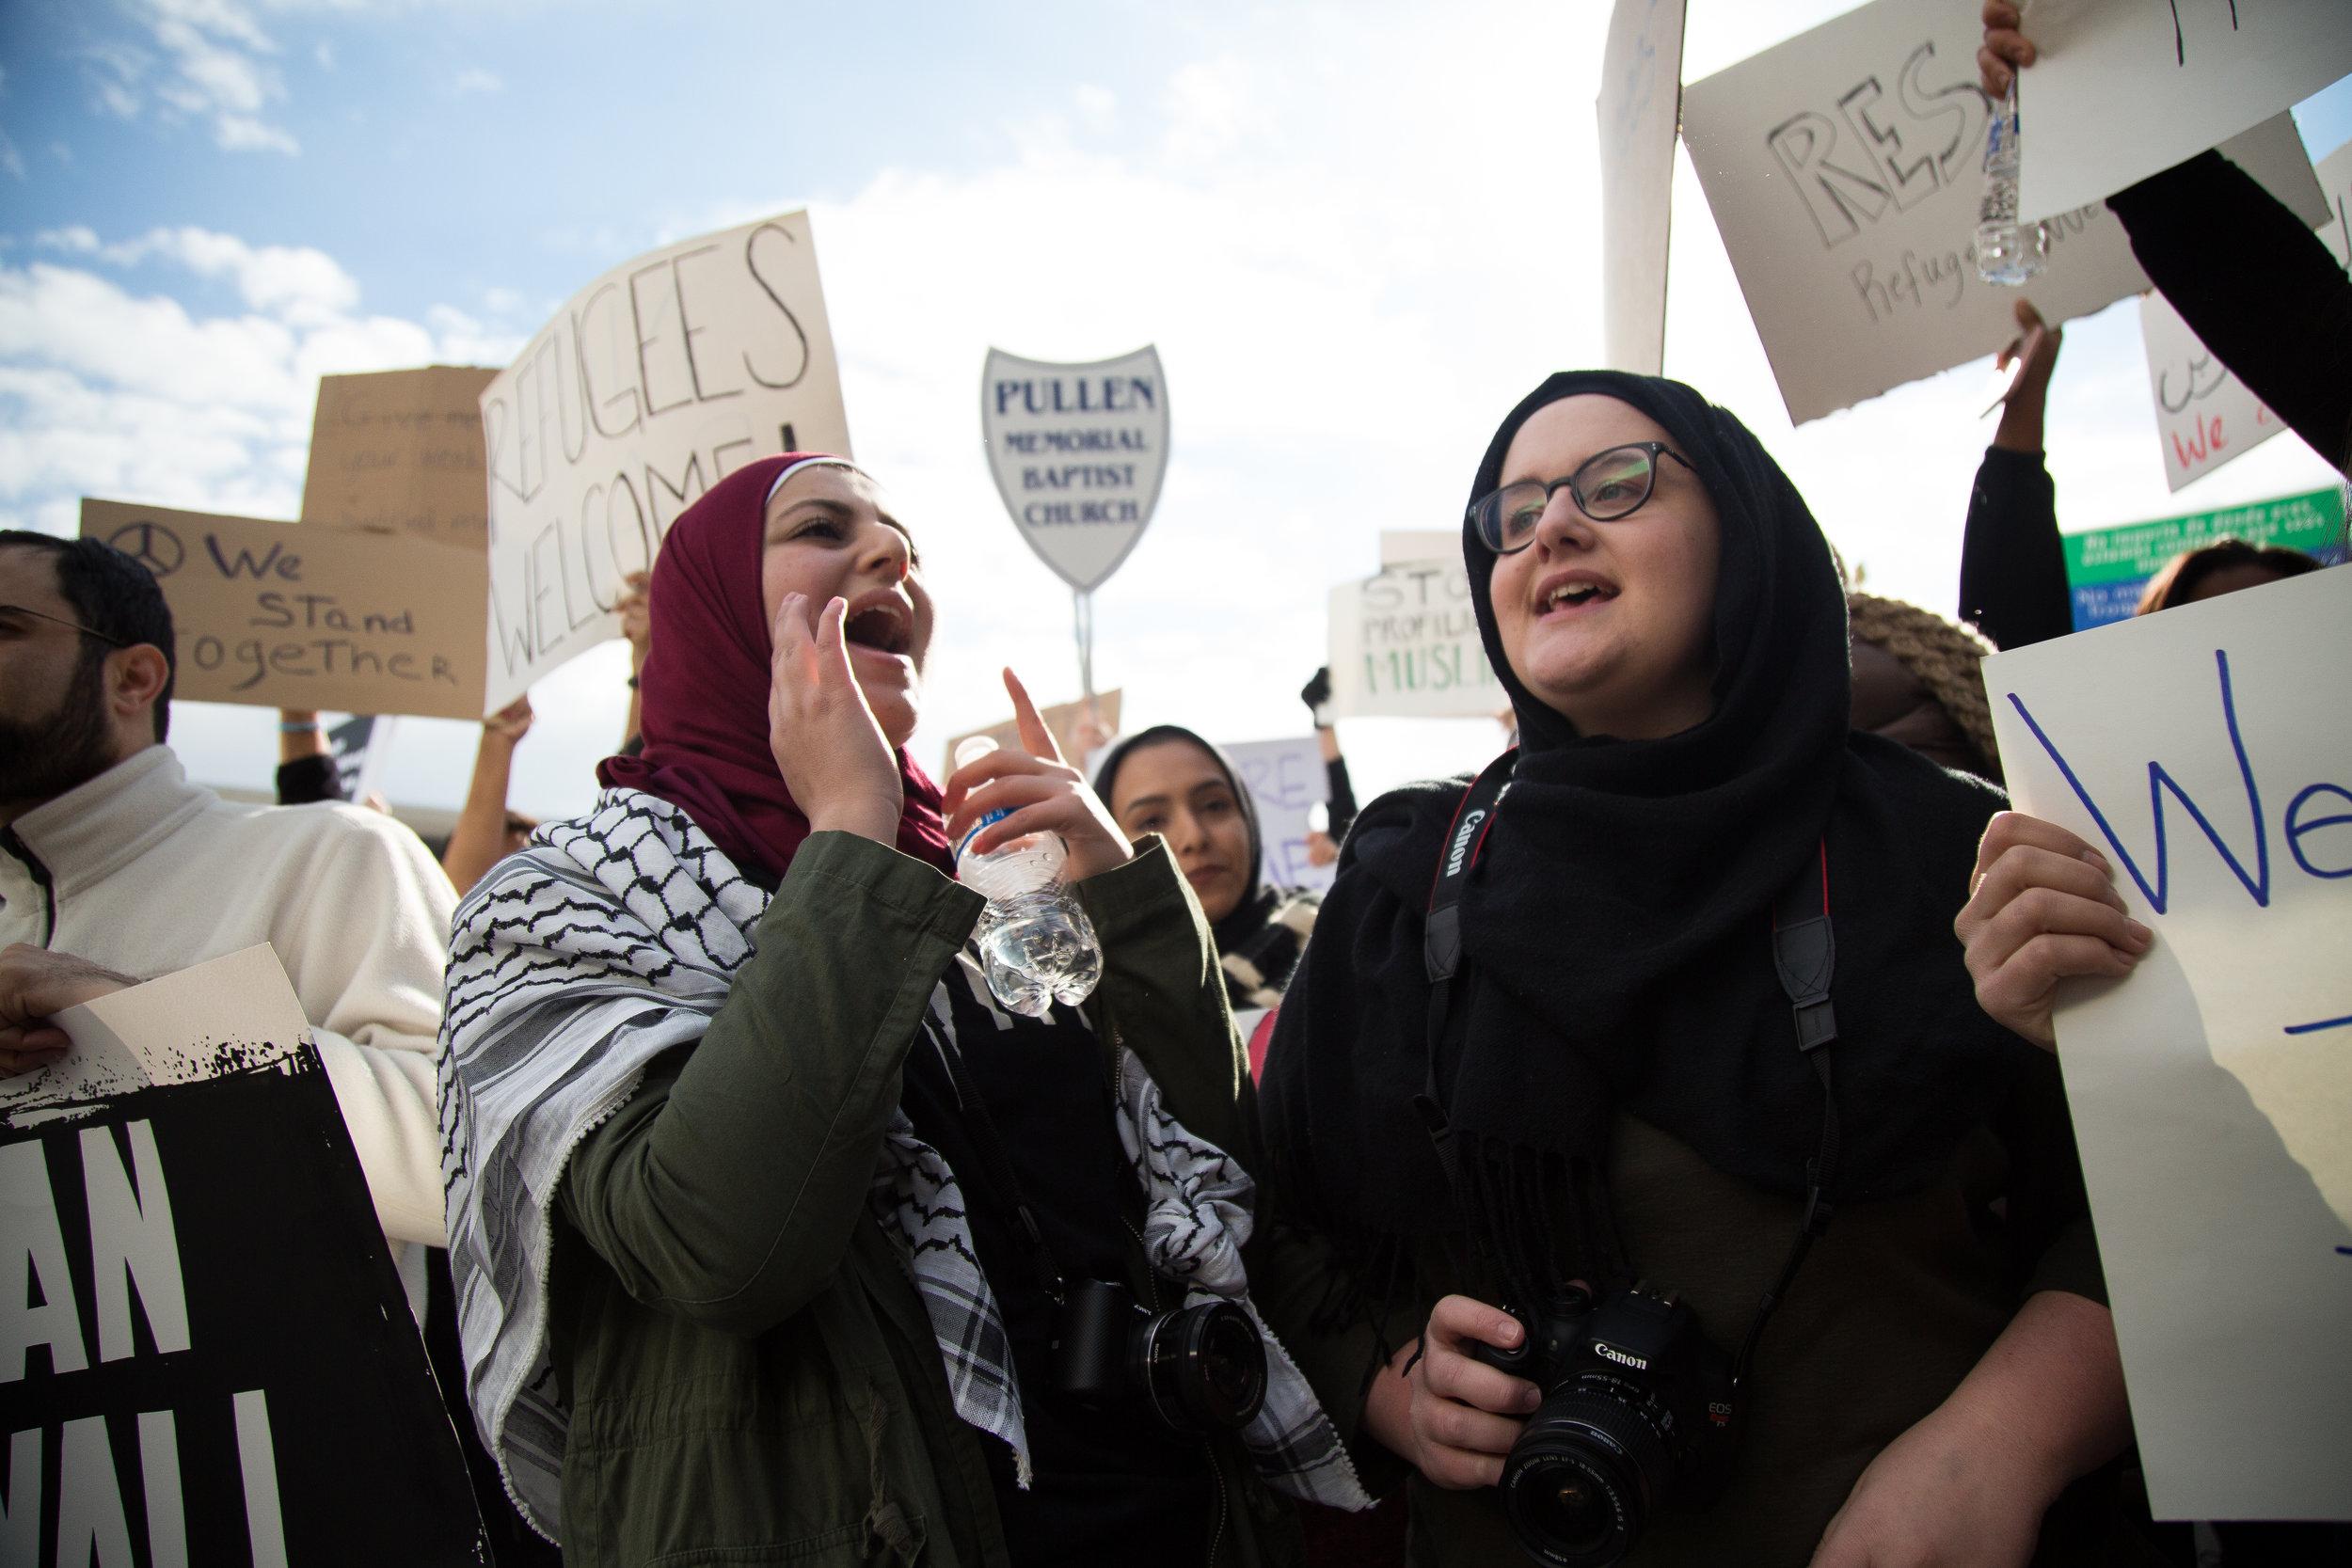 Protesting the 'Muslim Ban'